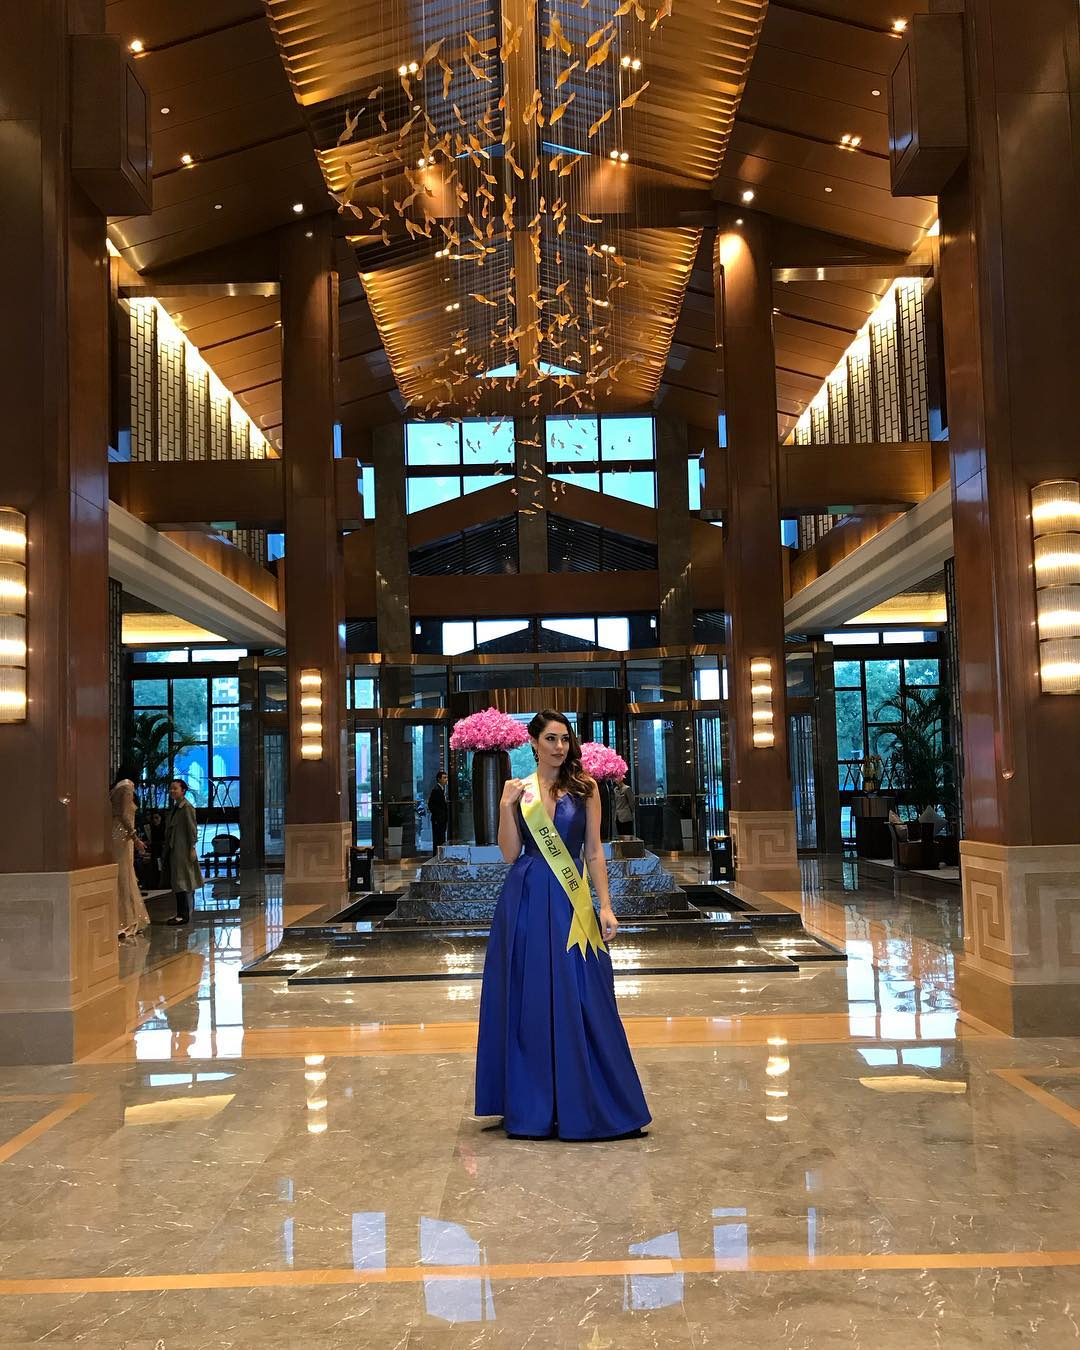 thais de mello candido, miss tourism world brazil 2018. - Página 3 39756210